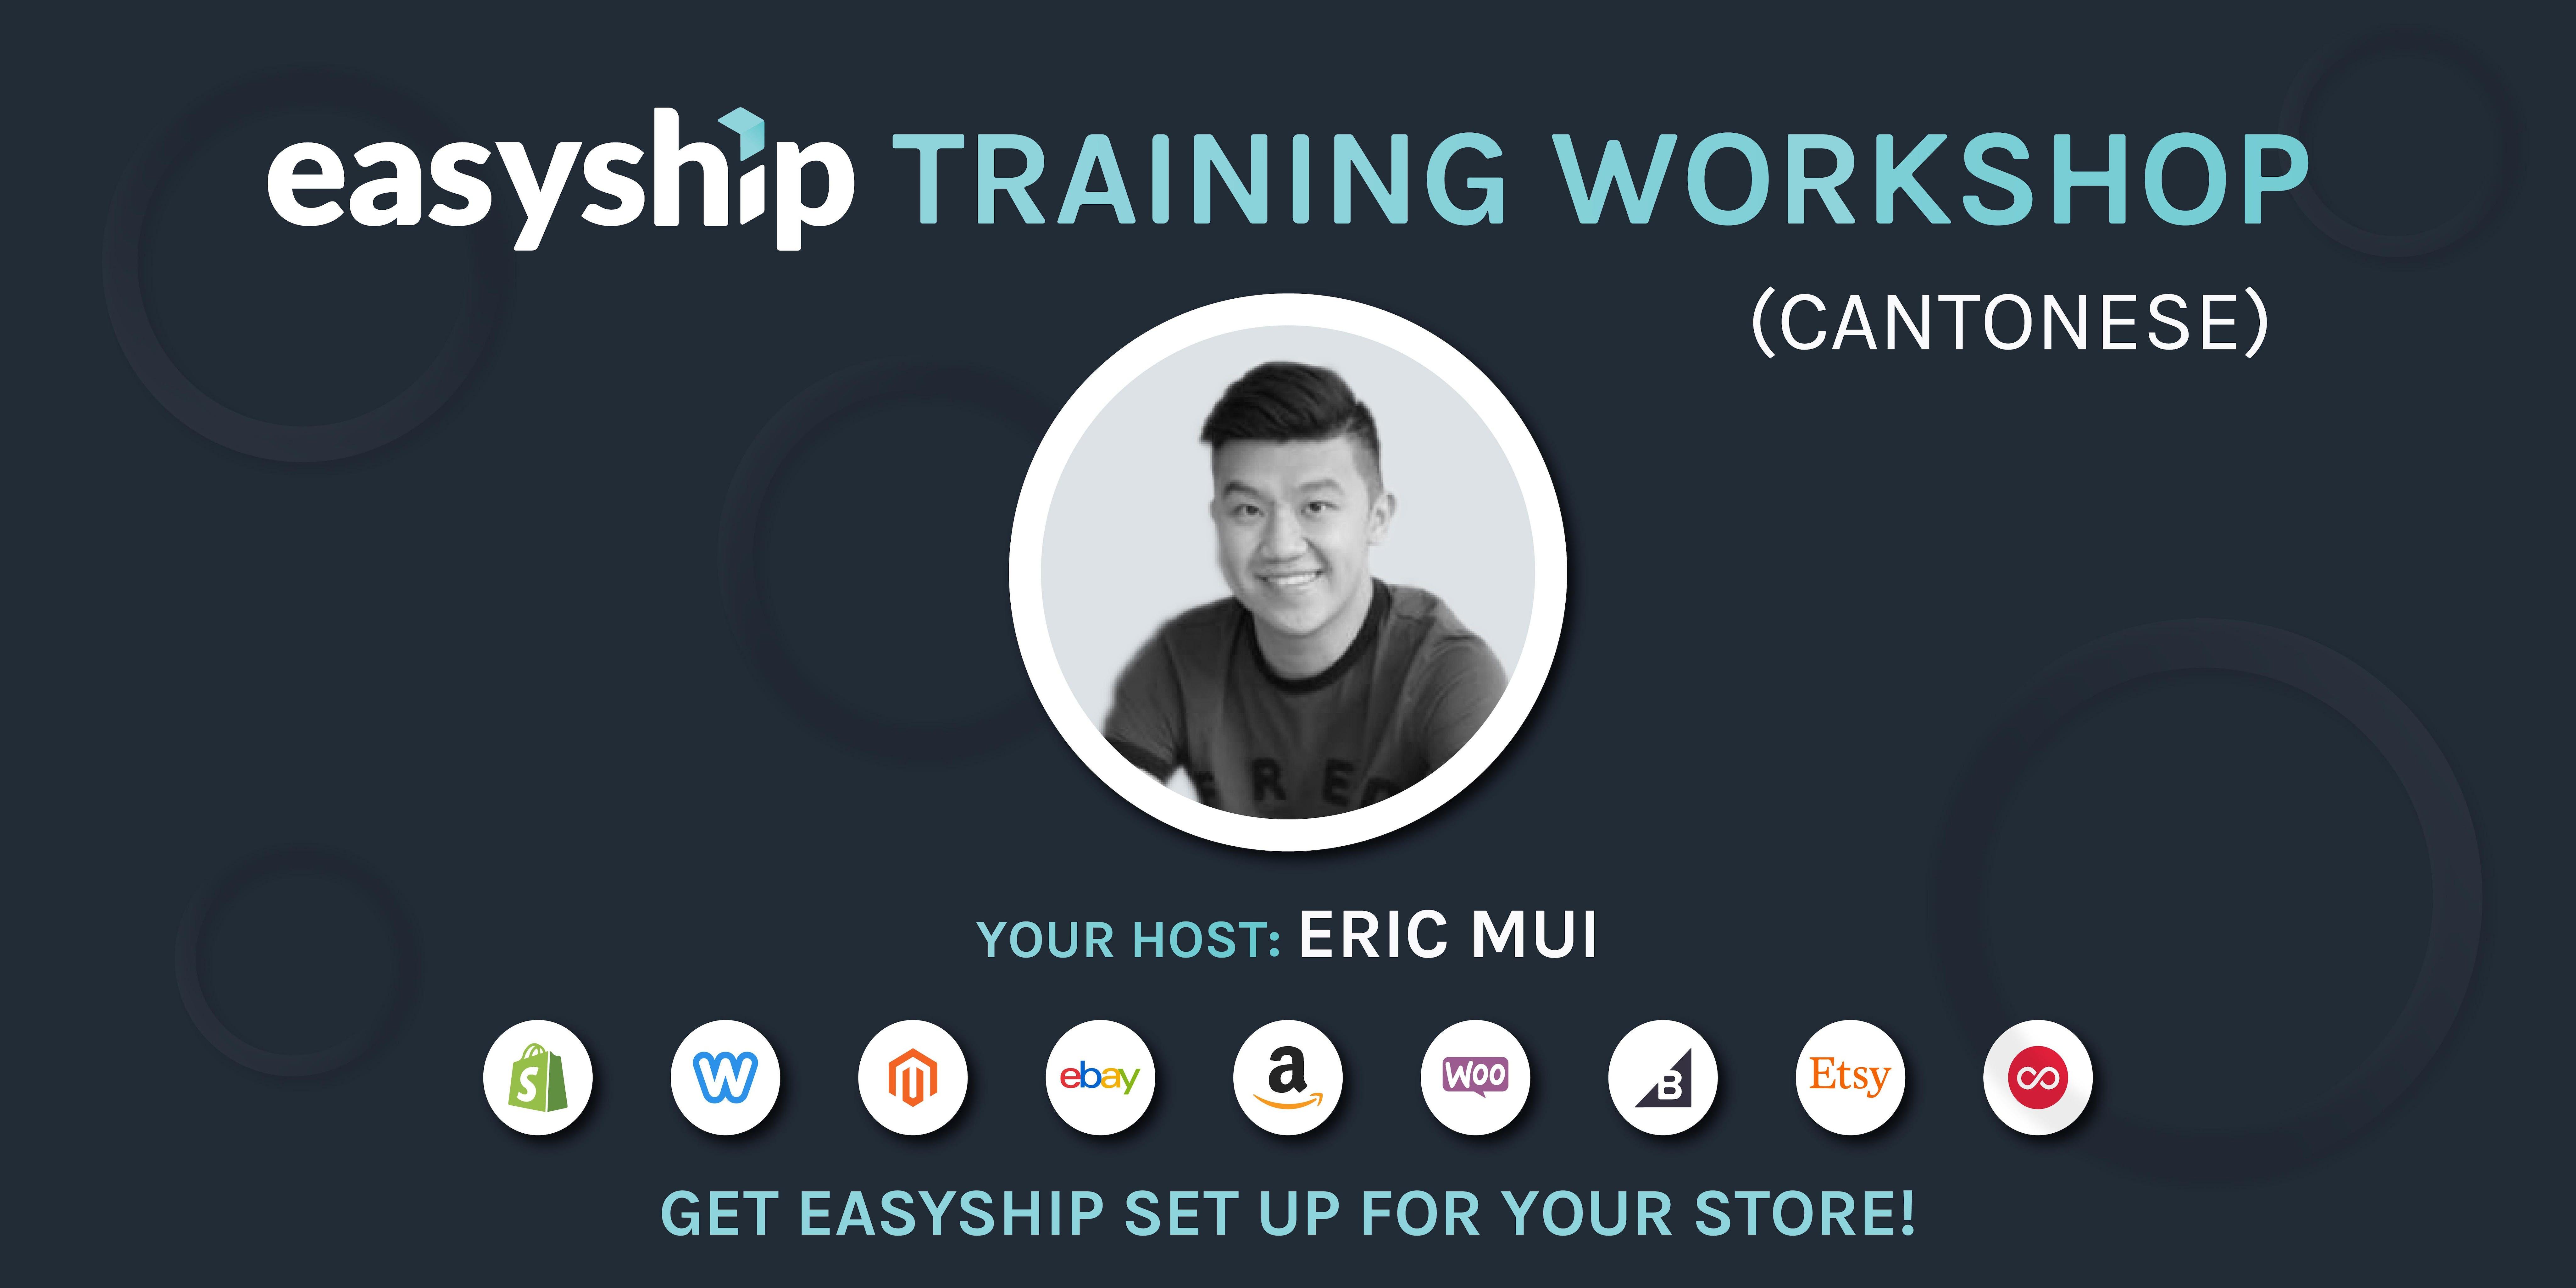 Easyship Training WORKSHOP (Cantonese)